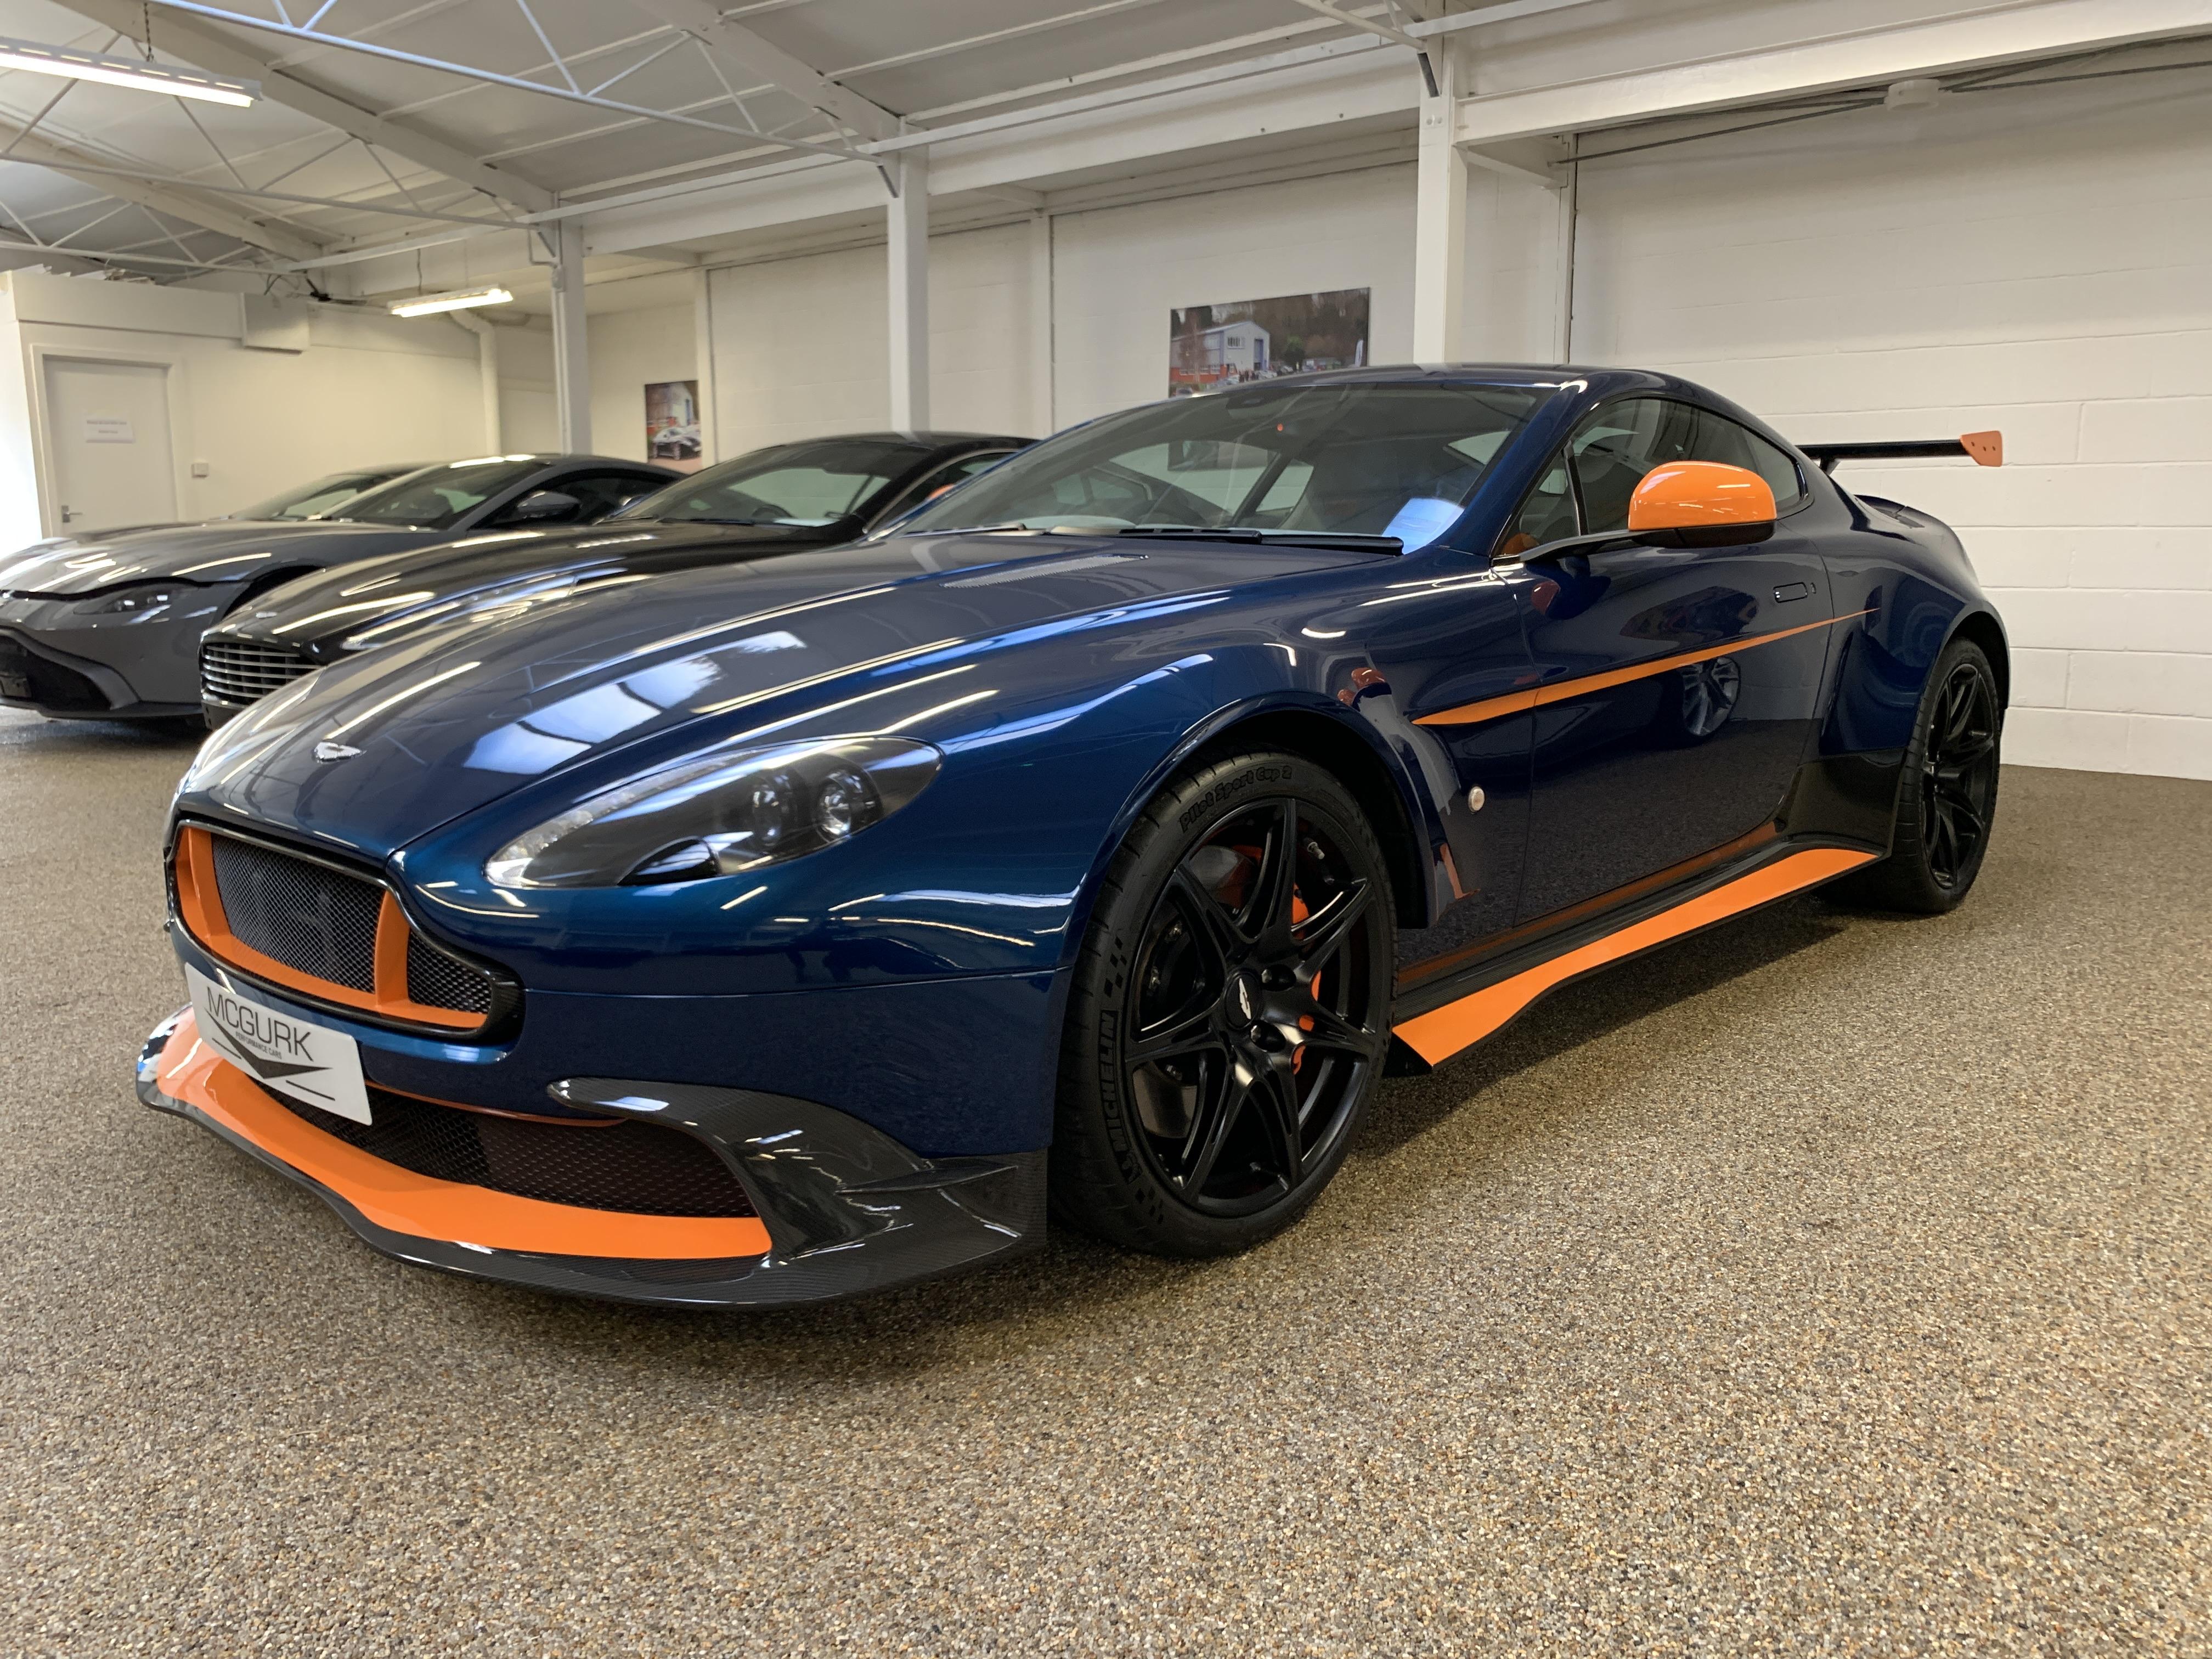 Aston Martin Gt8 2017 Mcgurk Performance Cars